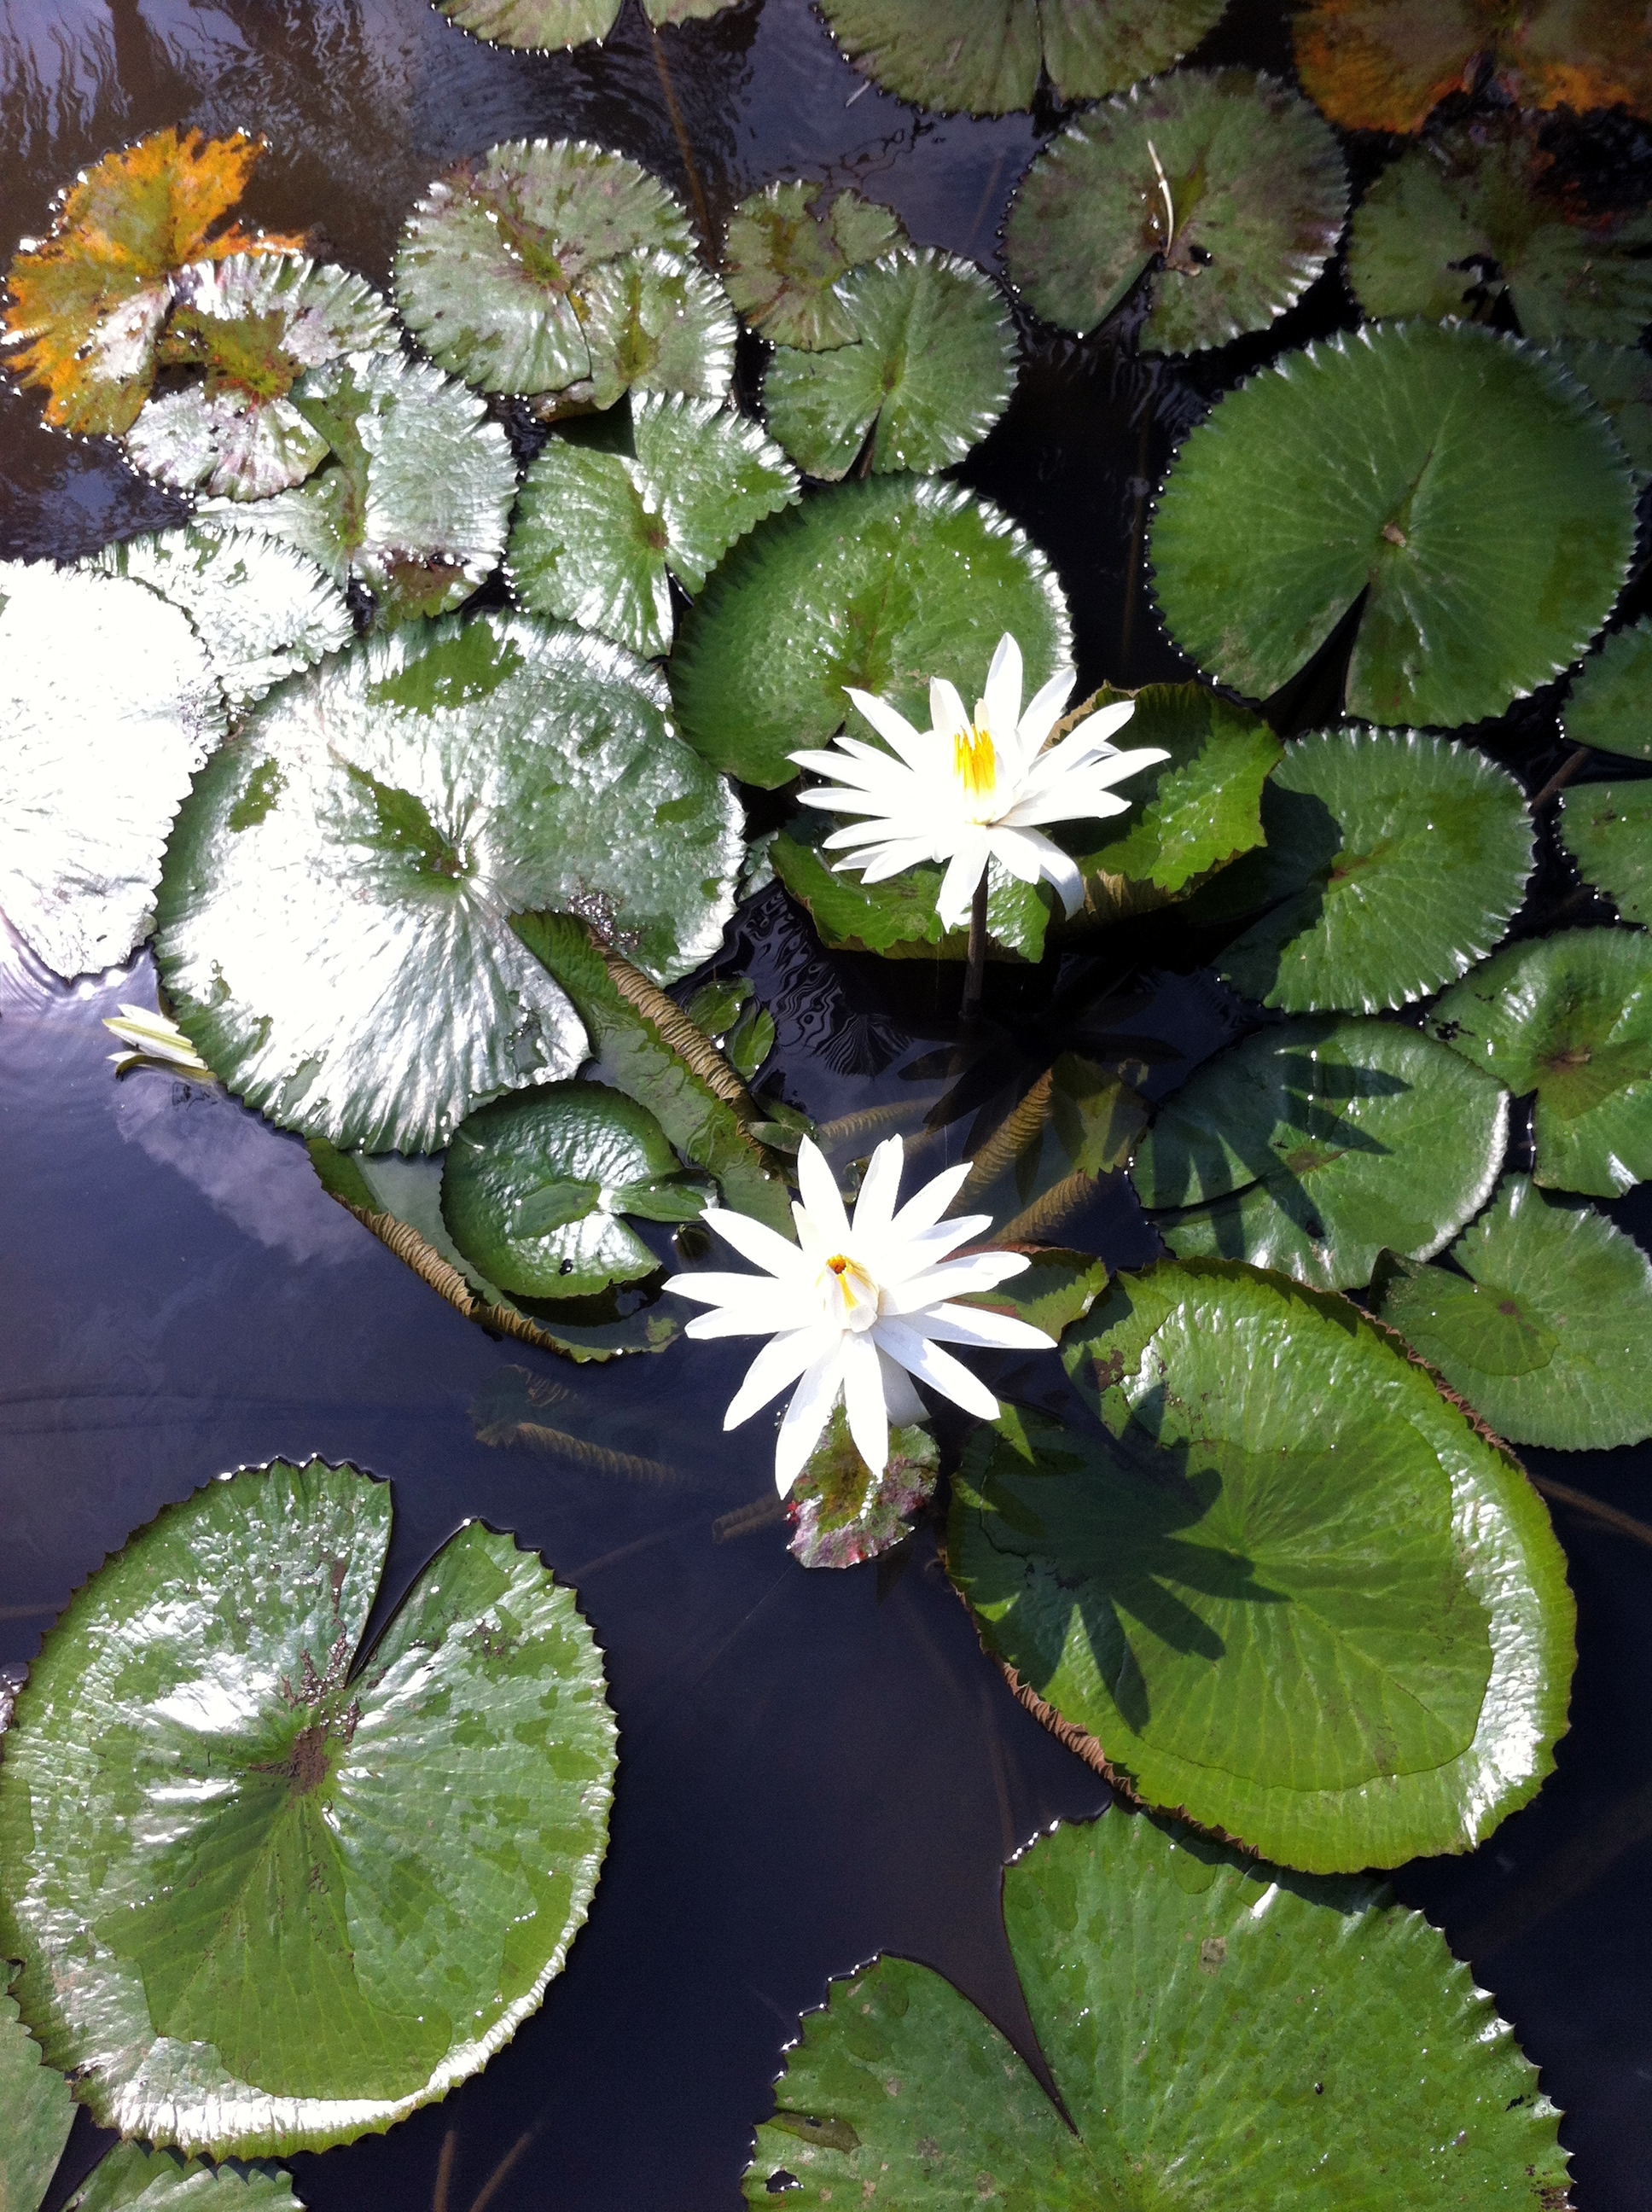 White Water Lilies at Kampung Naga